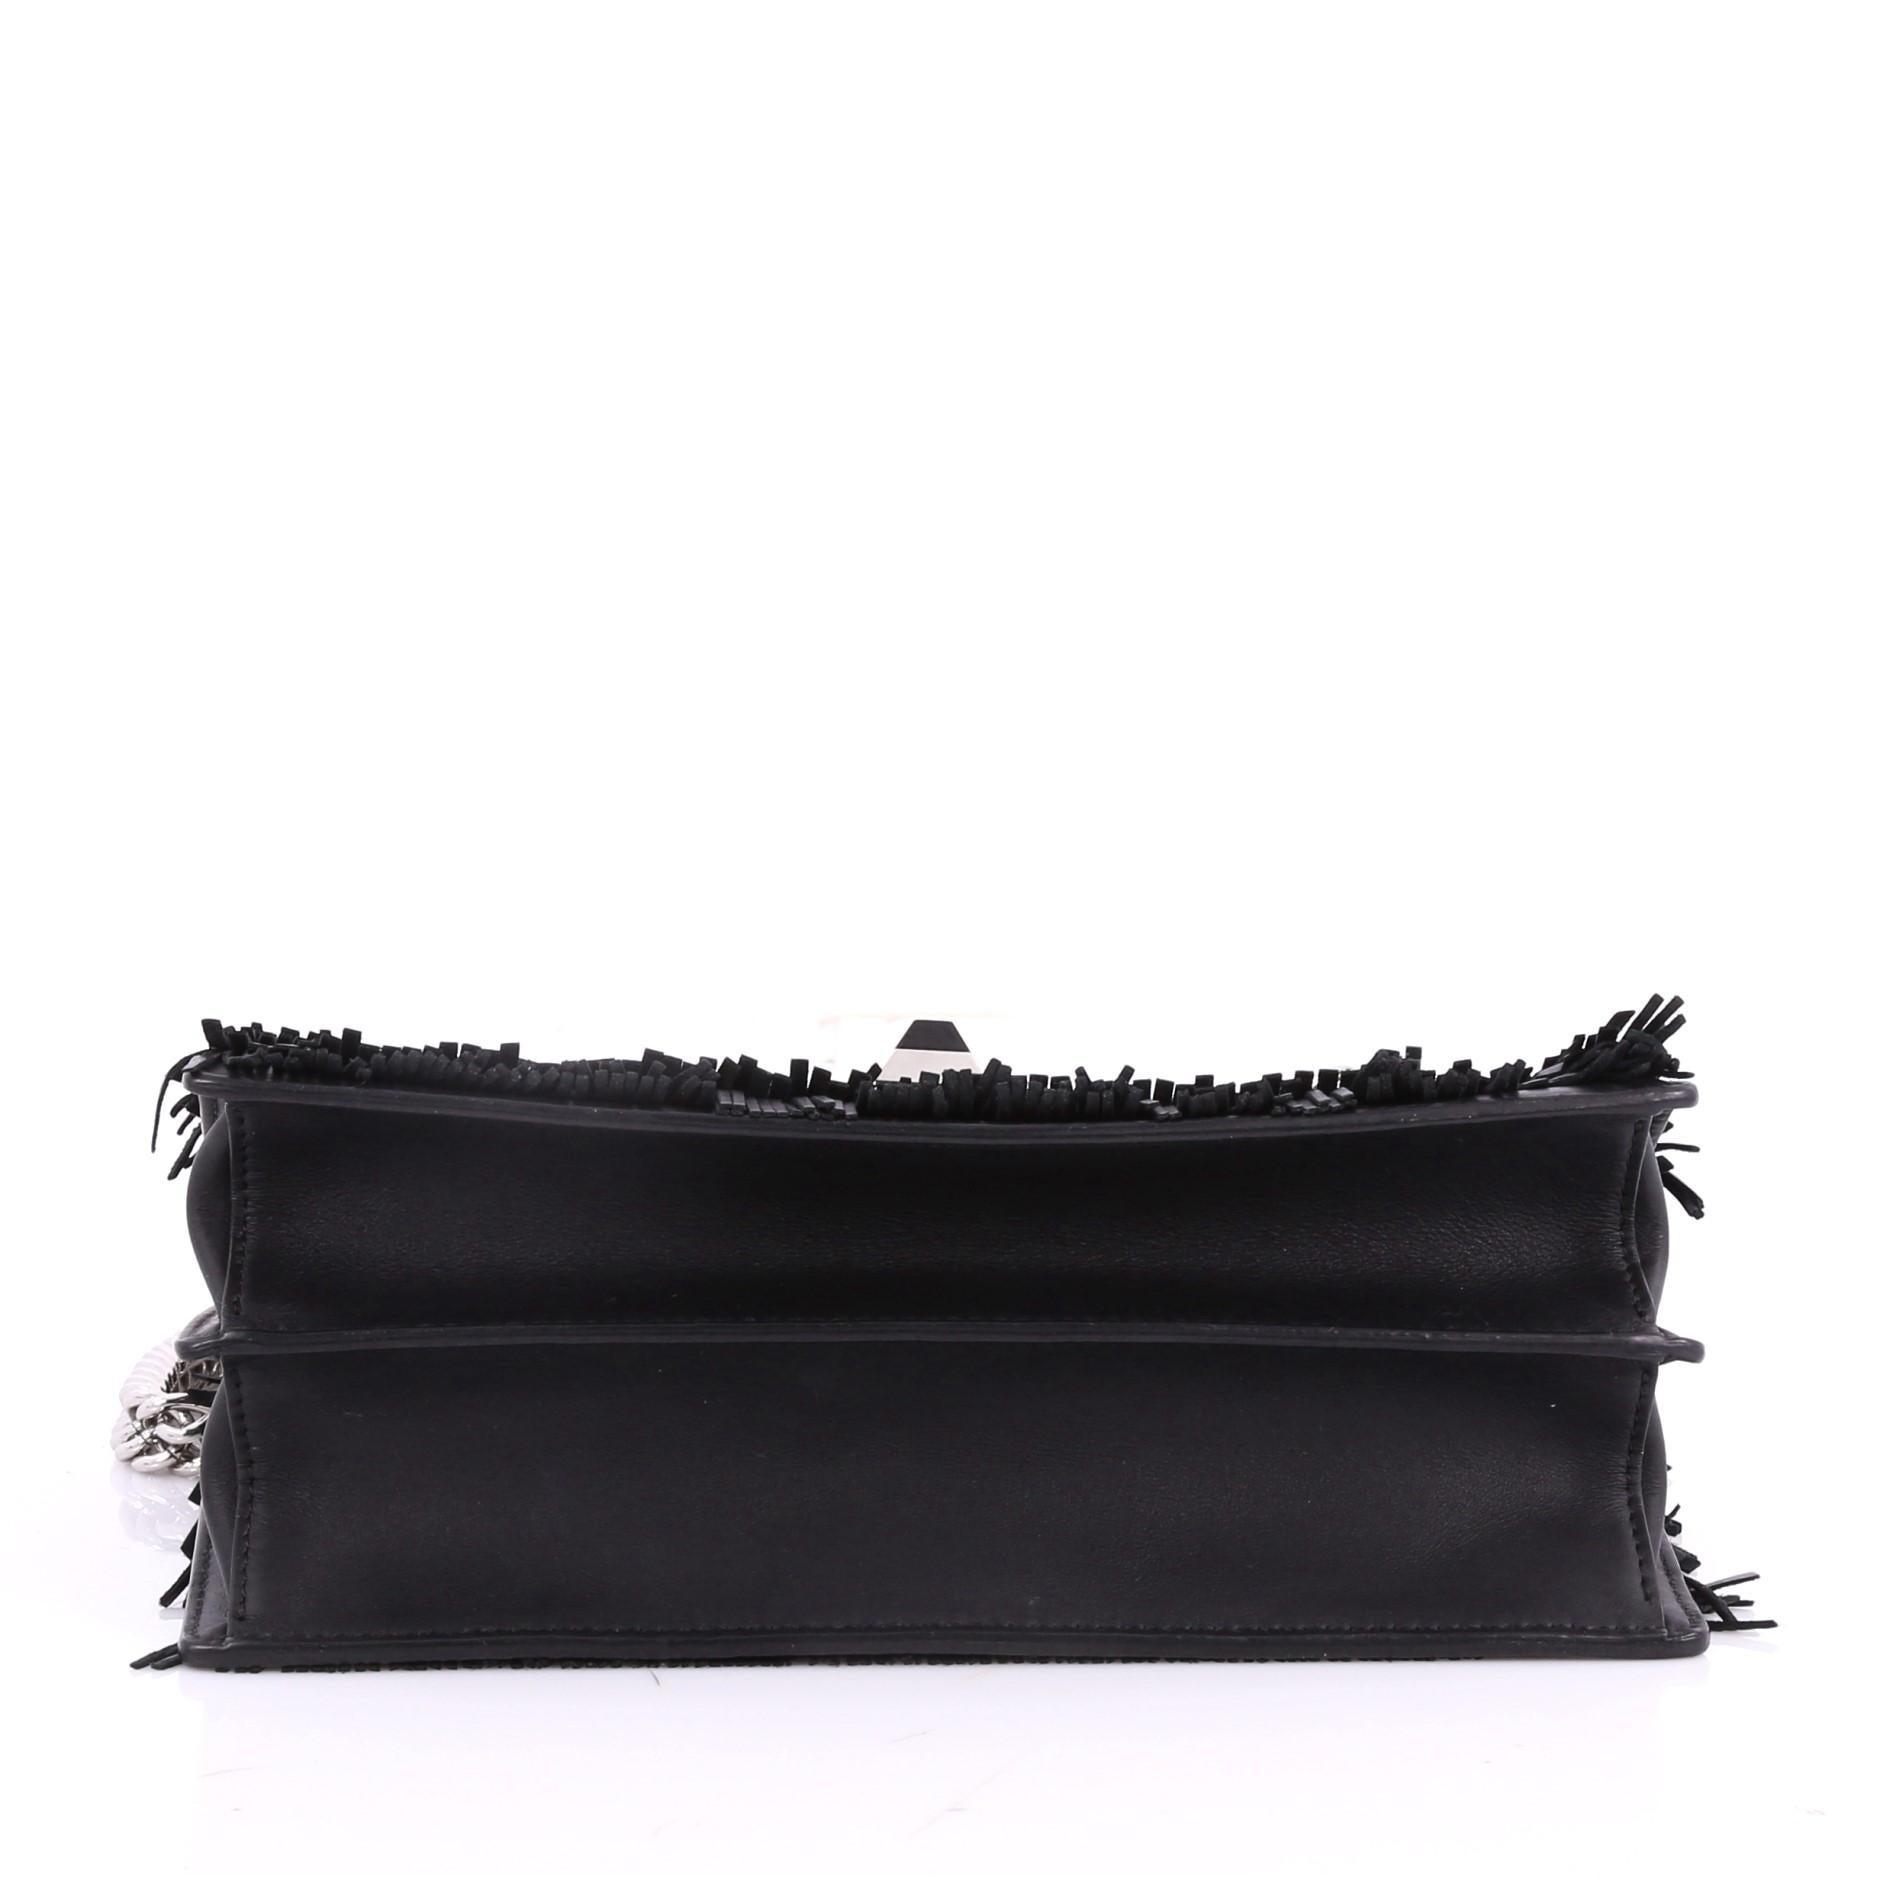 9a0878674b9b Fendi Monster Kan I Handbag Fringe Leather Medium at 1stdibs